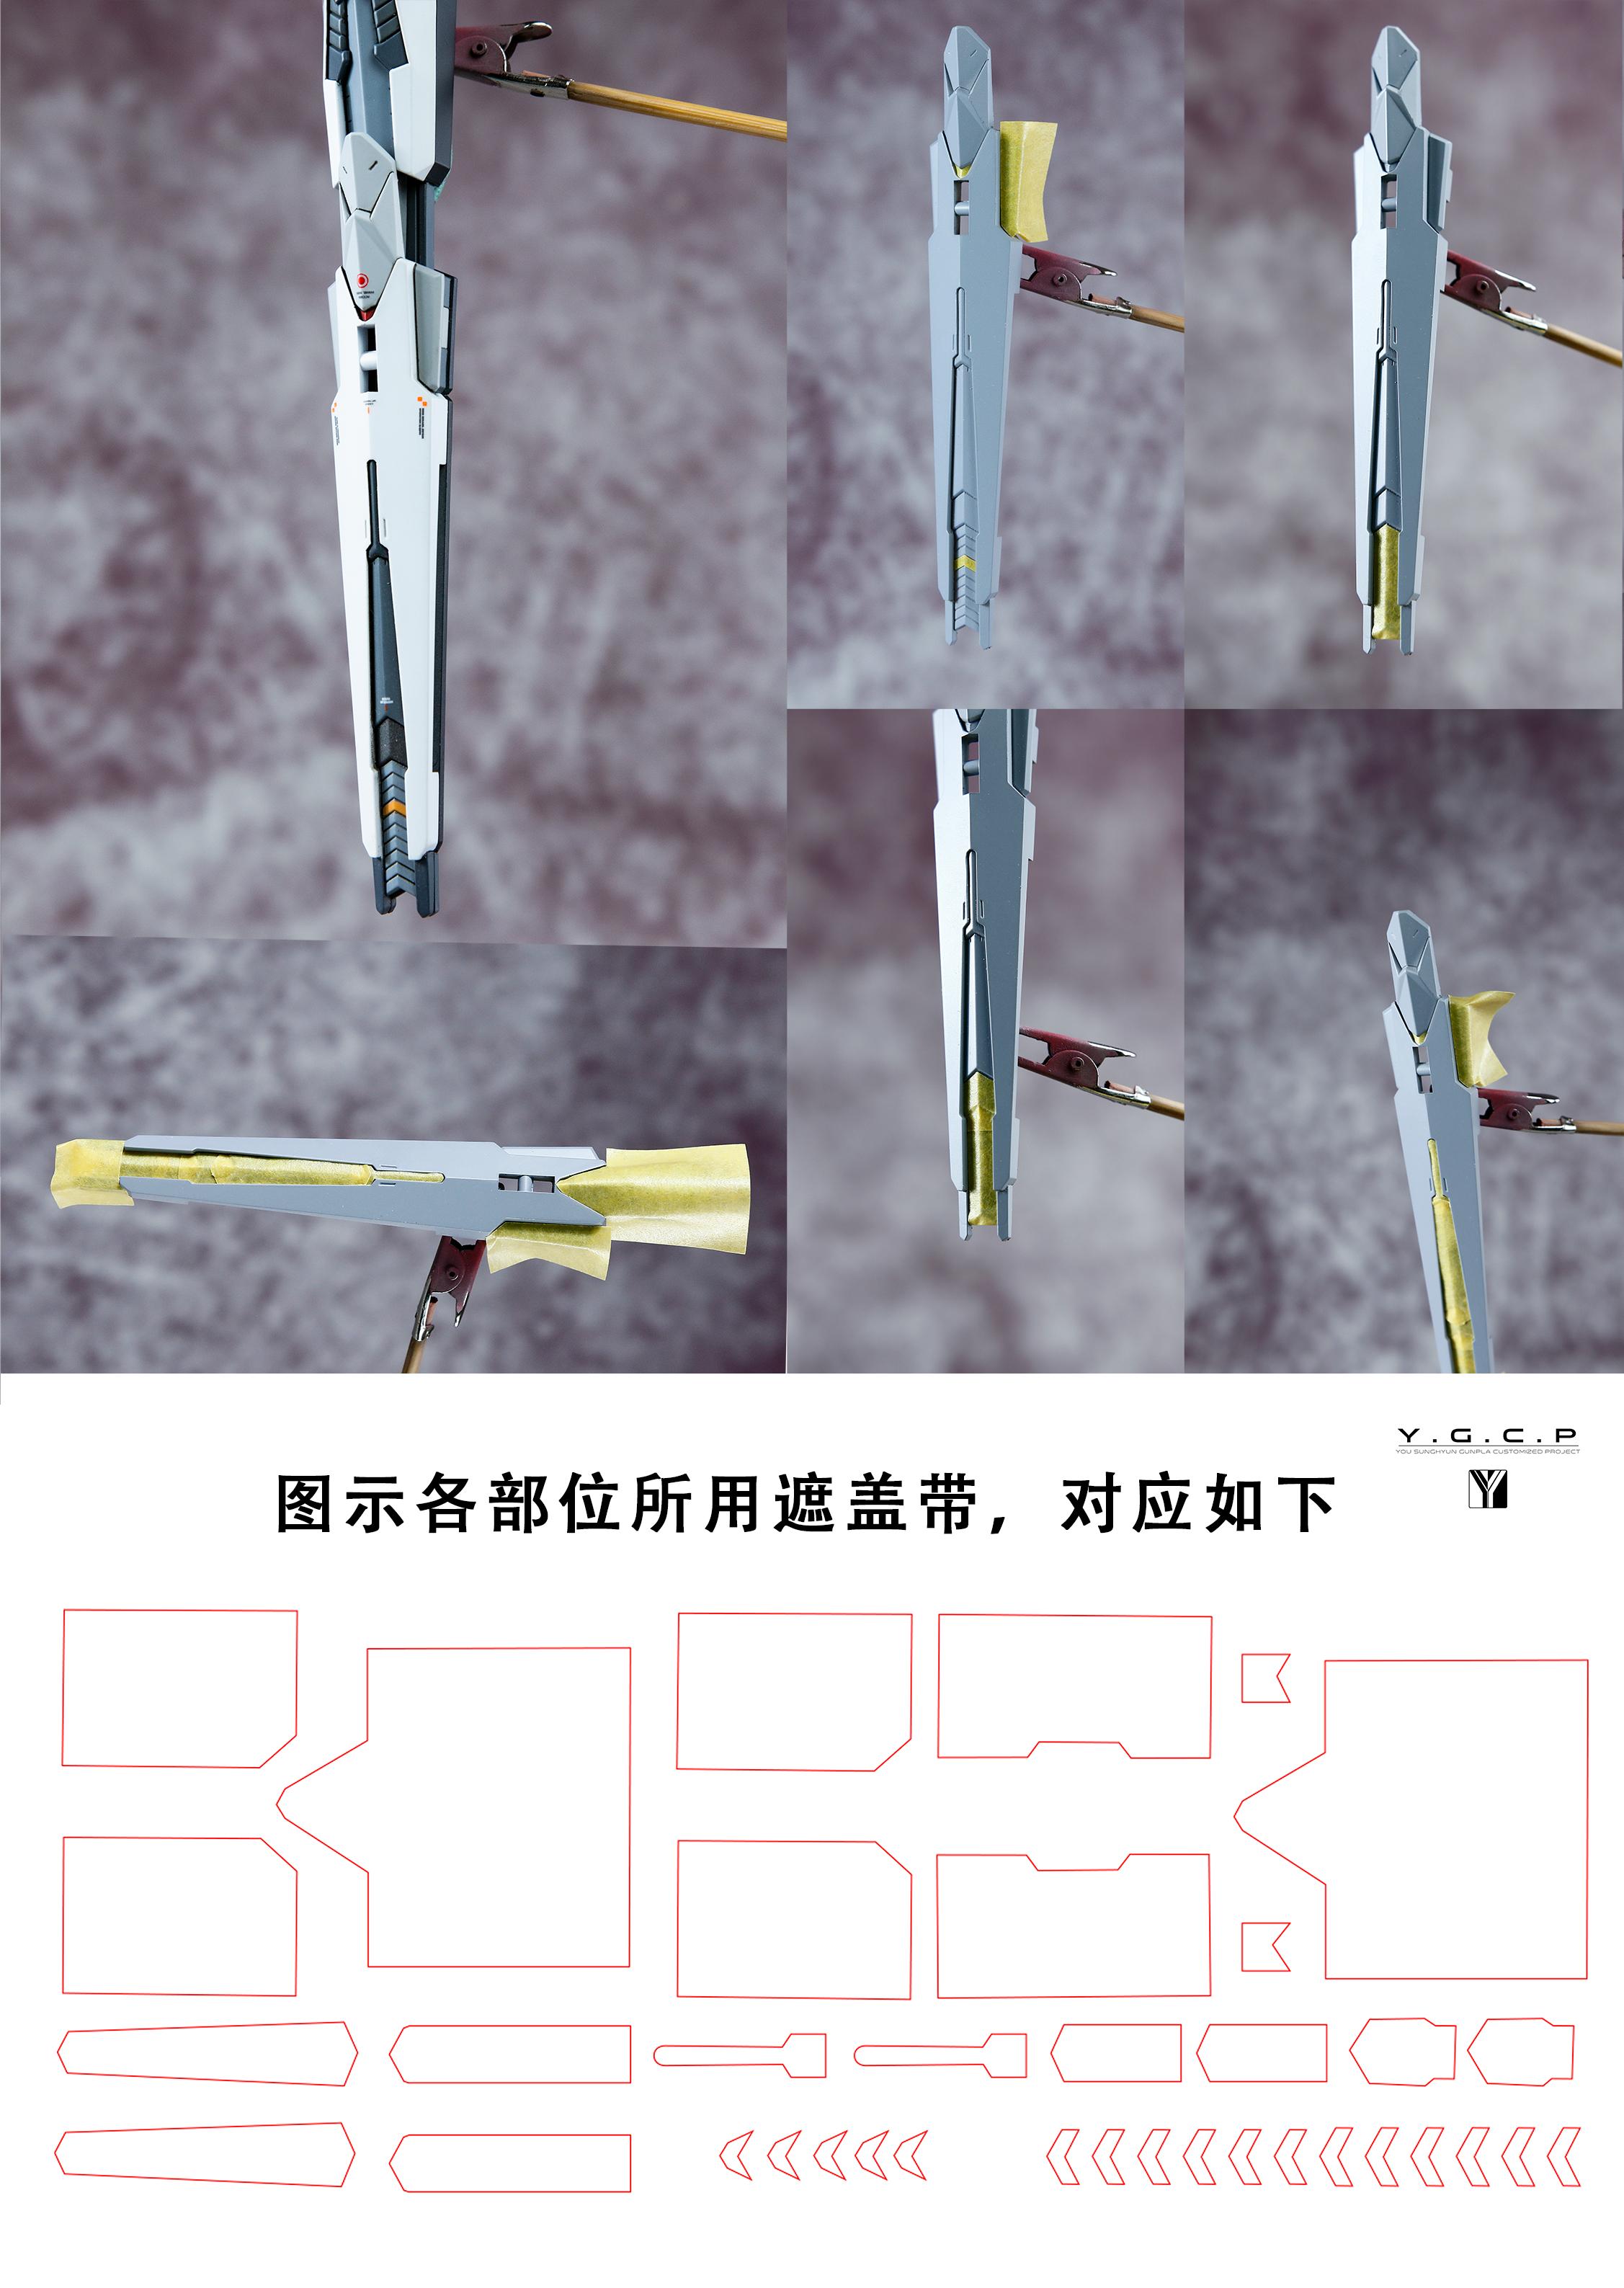 G825_YGCP_mg_yujiaoland_masking_tape_nu_005.jpg